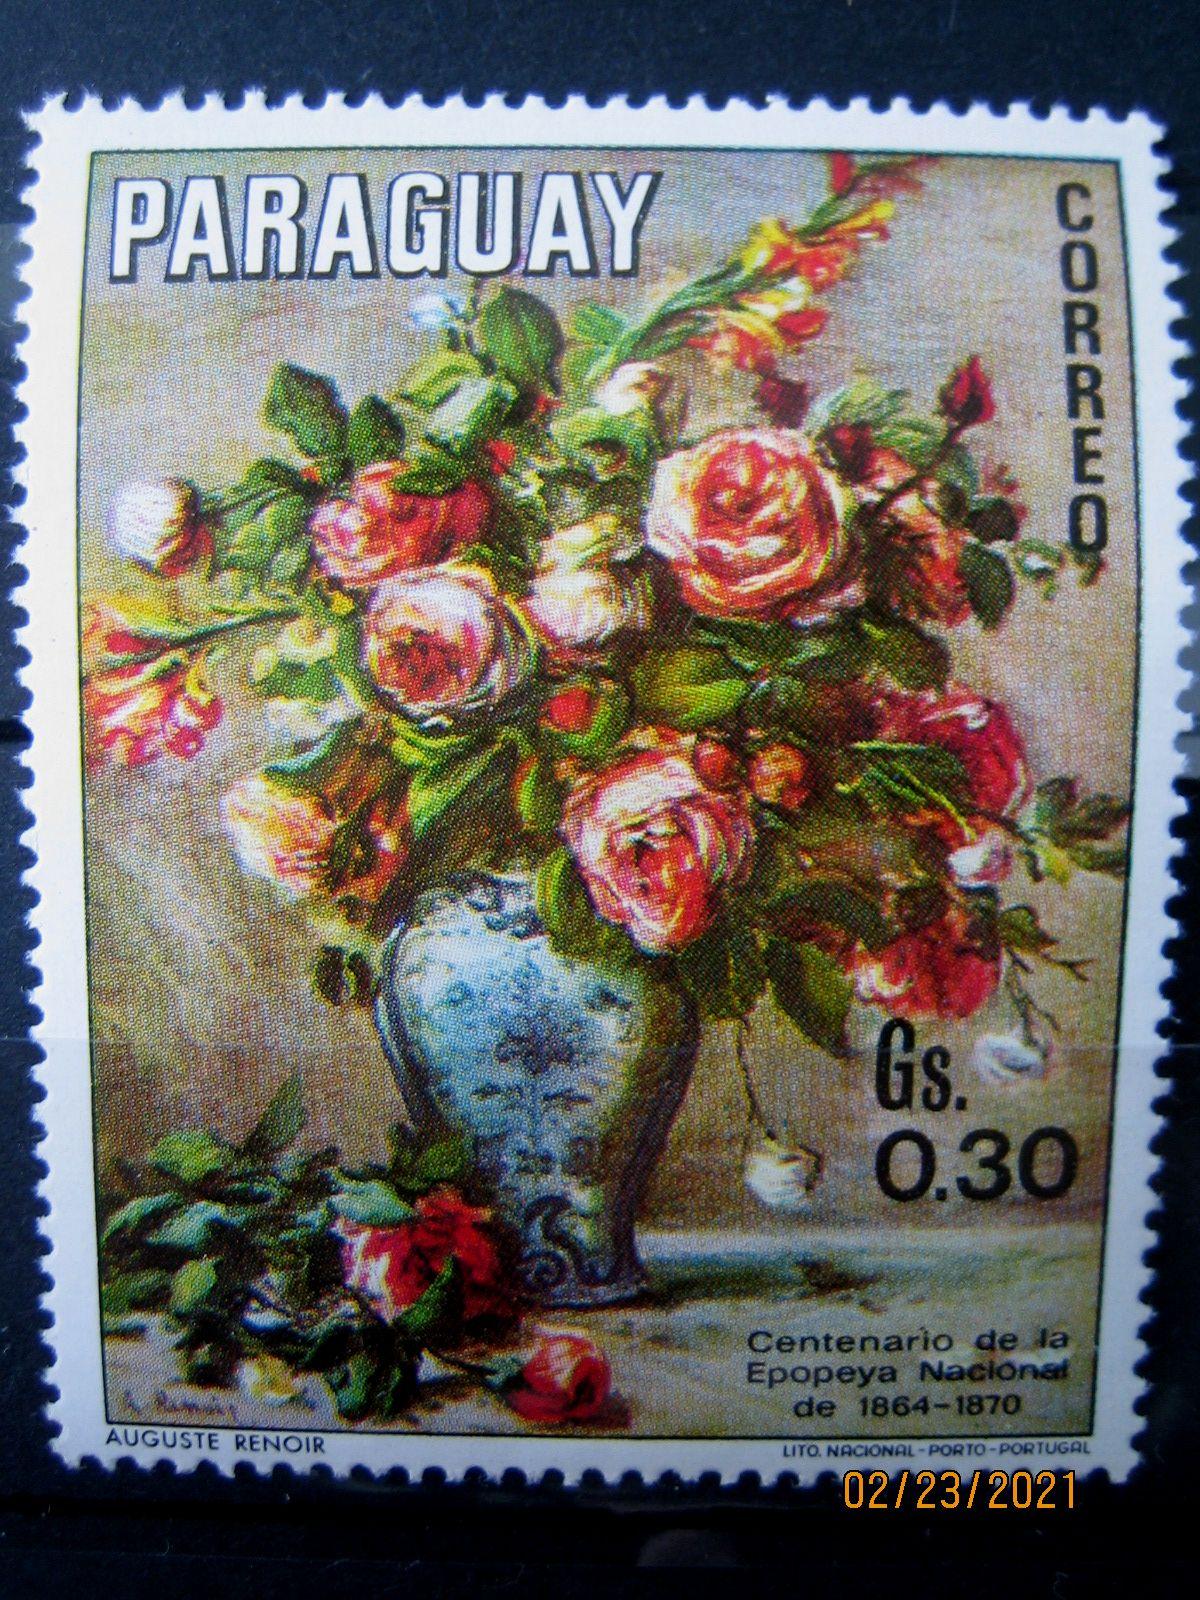 Марка Парагвай, 1970 г. Флора, 100-летие национального эпоса 1864-1870, на марке представлена Цветочная композиция; Ренуар, Mi:PY 2096, Sn:PY 1299e, Yt:PY 1093, номинал — 0.30 Gs (гурани)